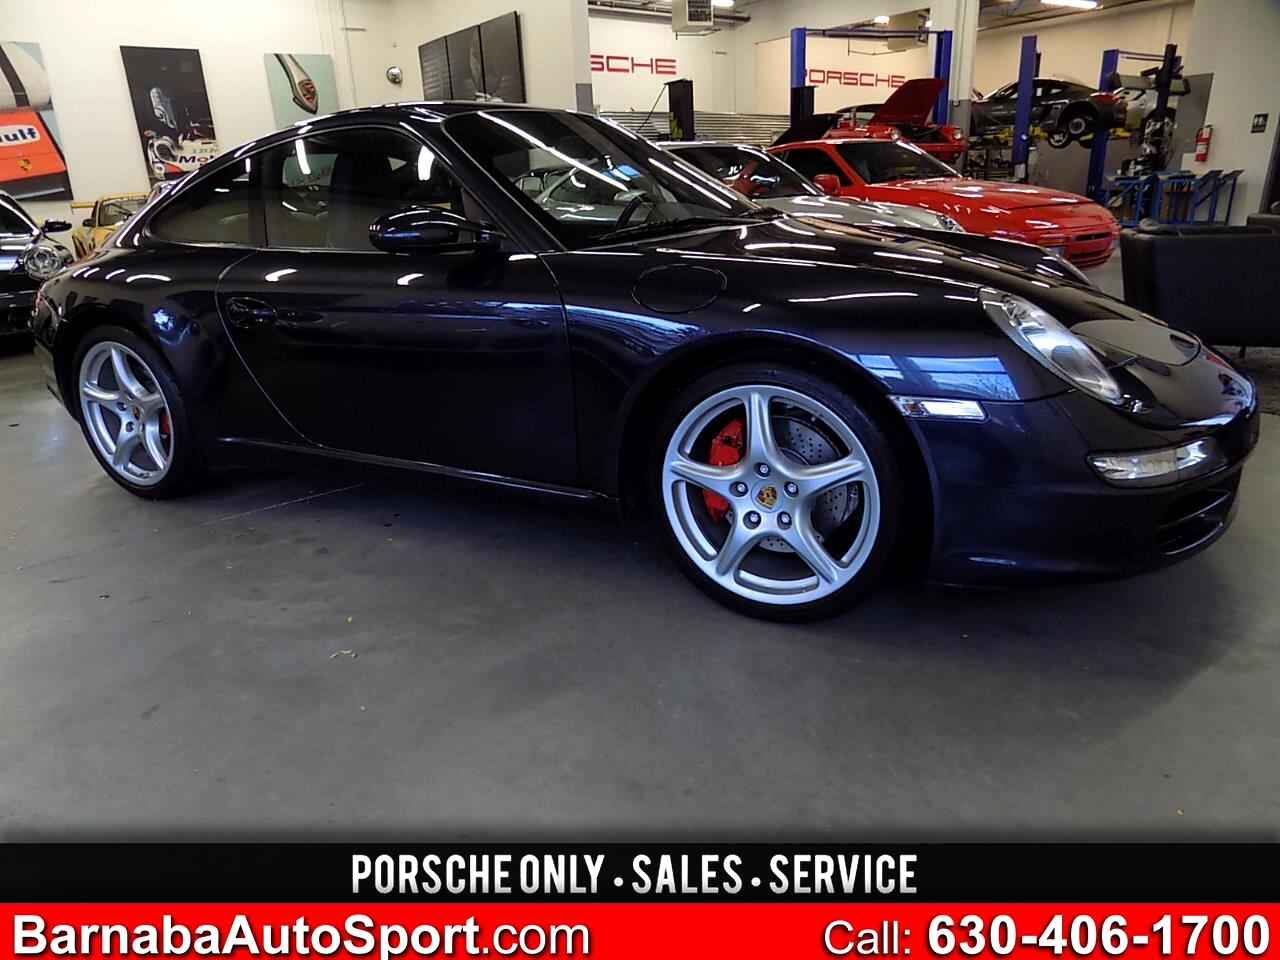 Porsche 911 Carrera S 2007